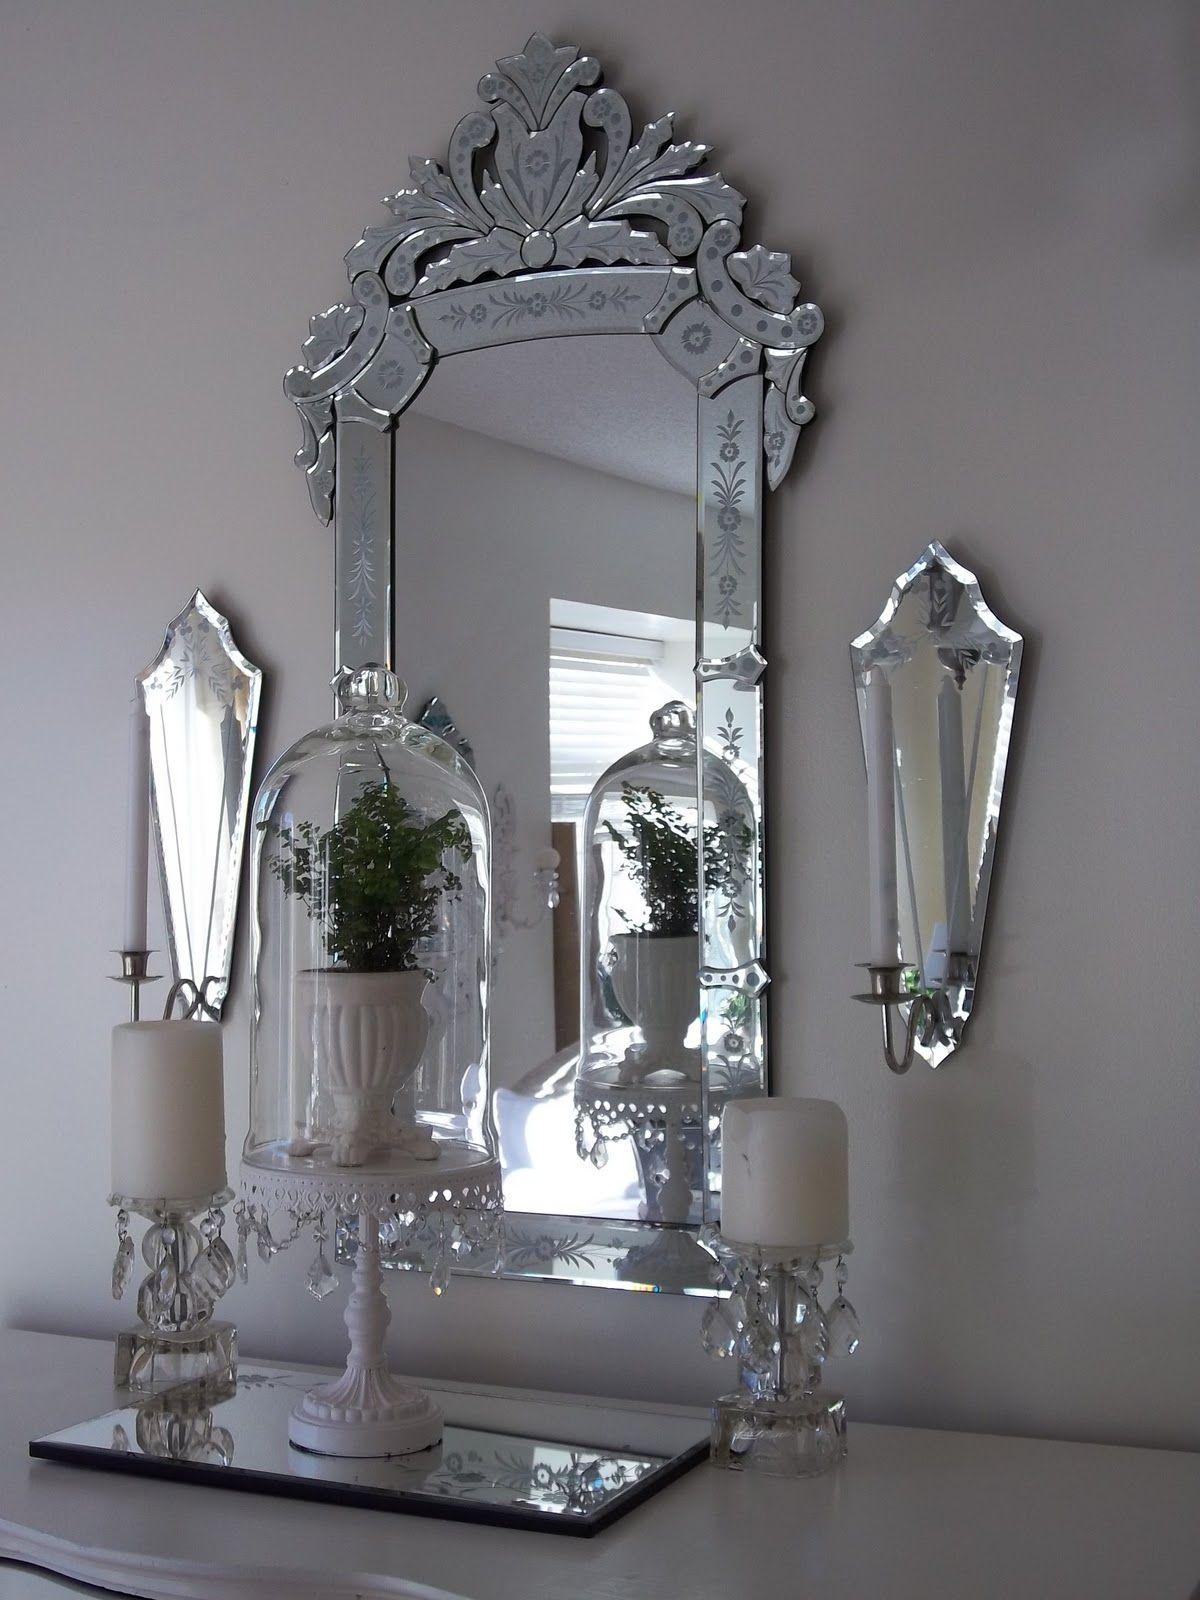 White Cottage Chic October 2010 Venetian Mirror Living Room Venetian Mirrors Mirror Wall